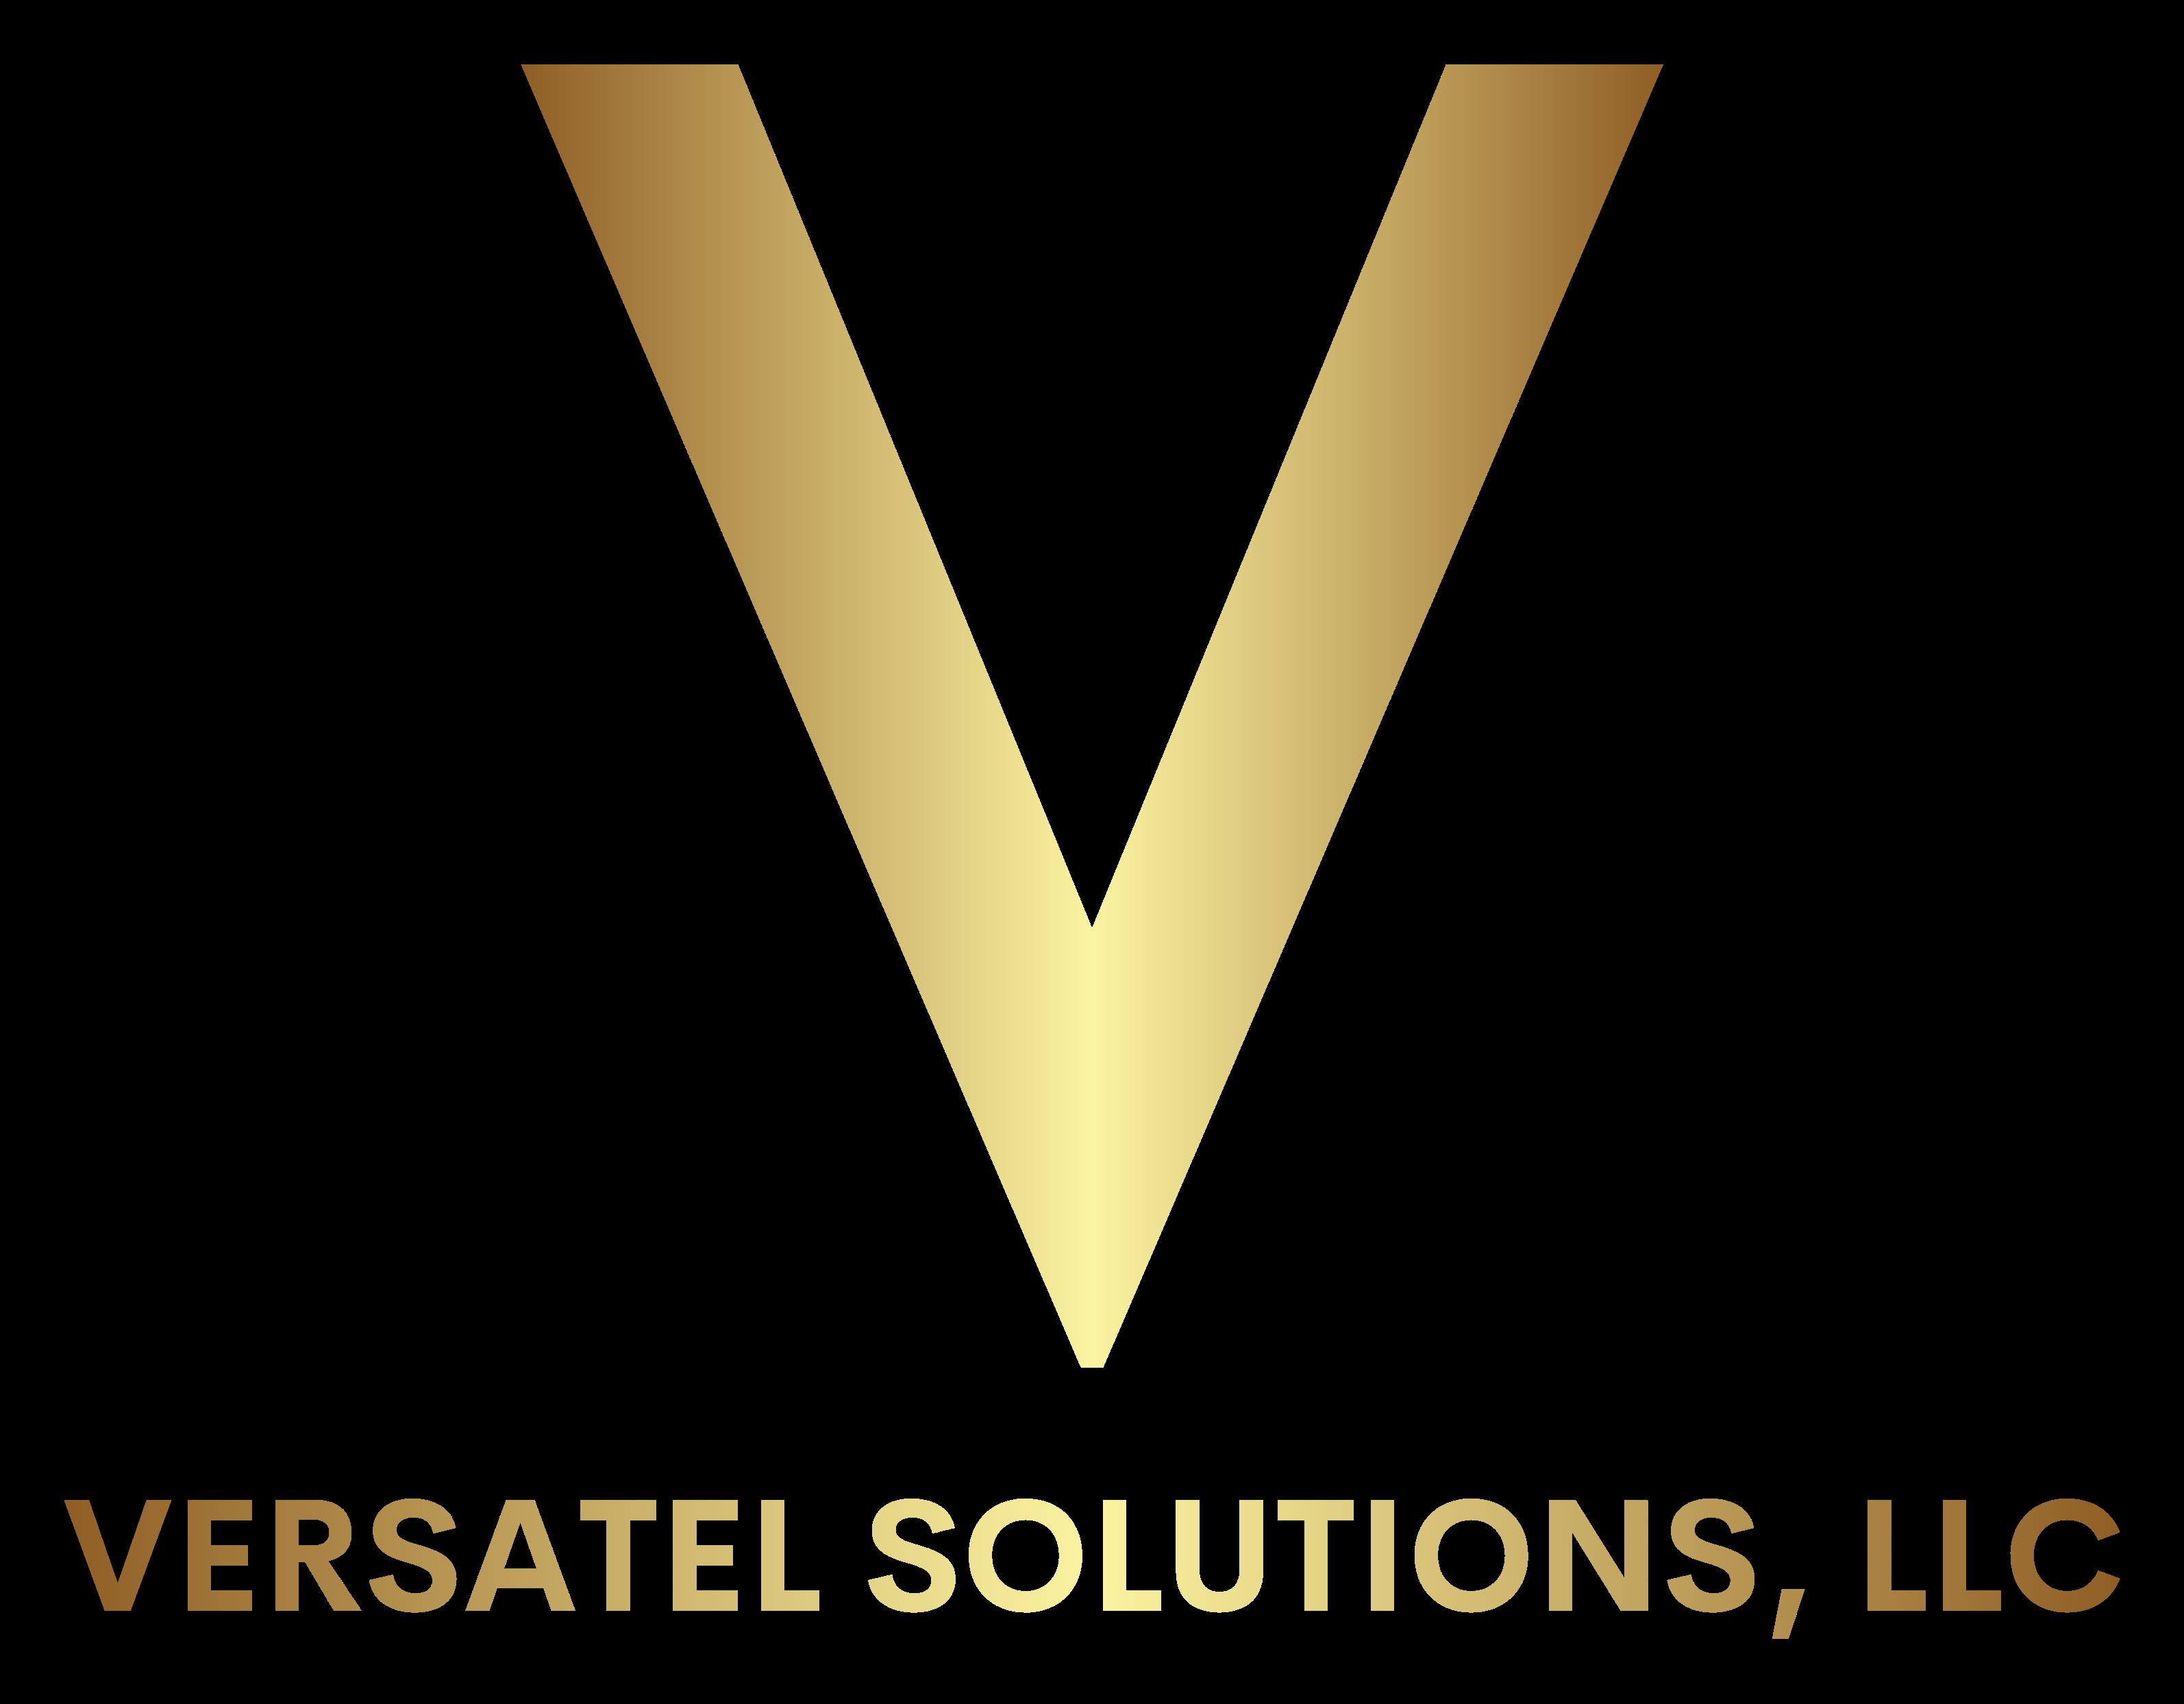 VersaTel Solutions